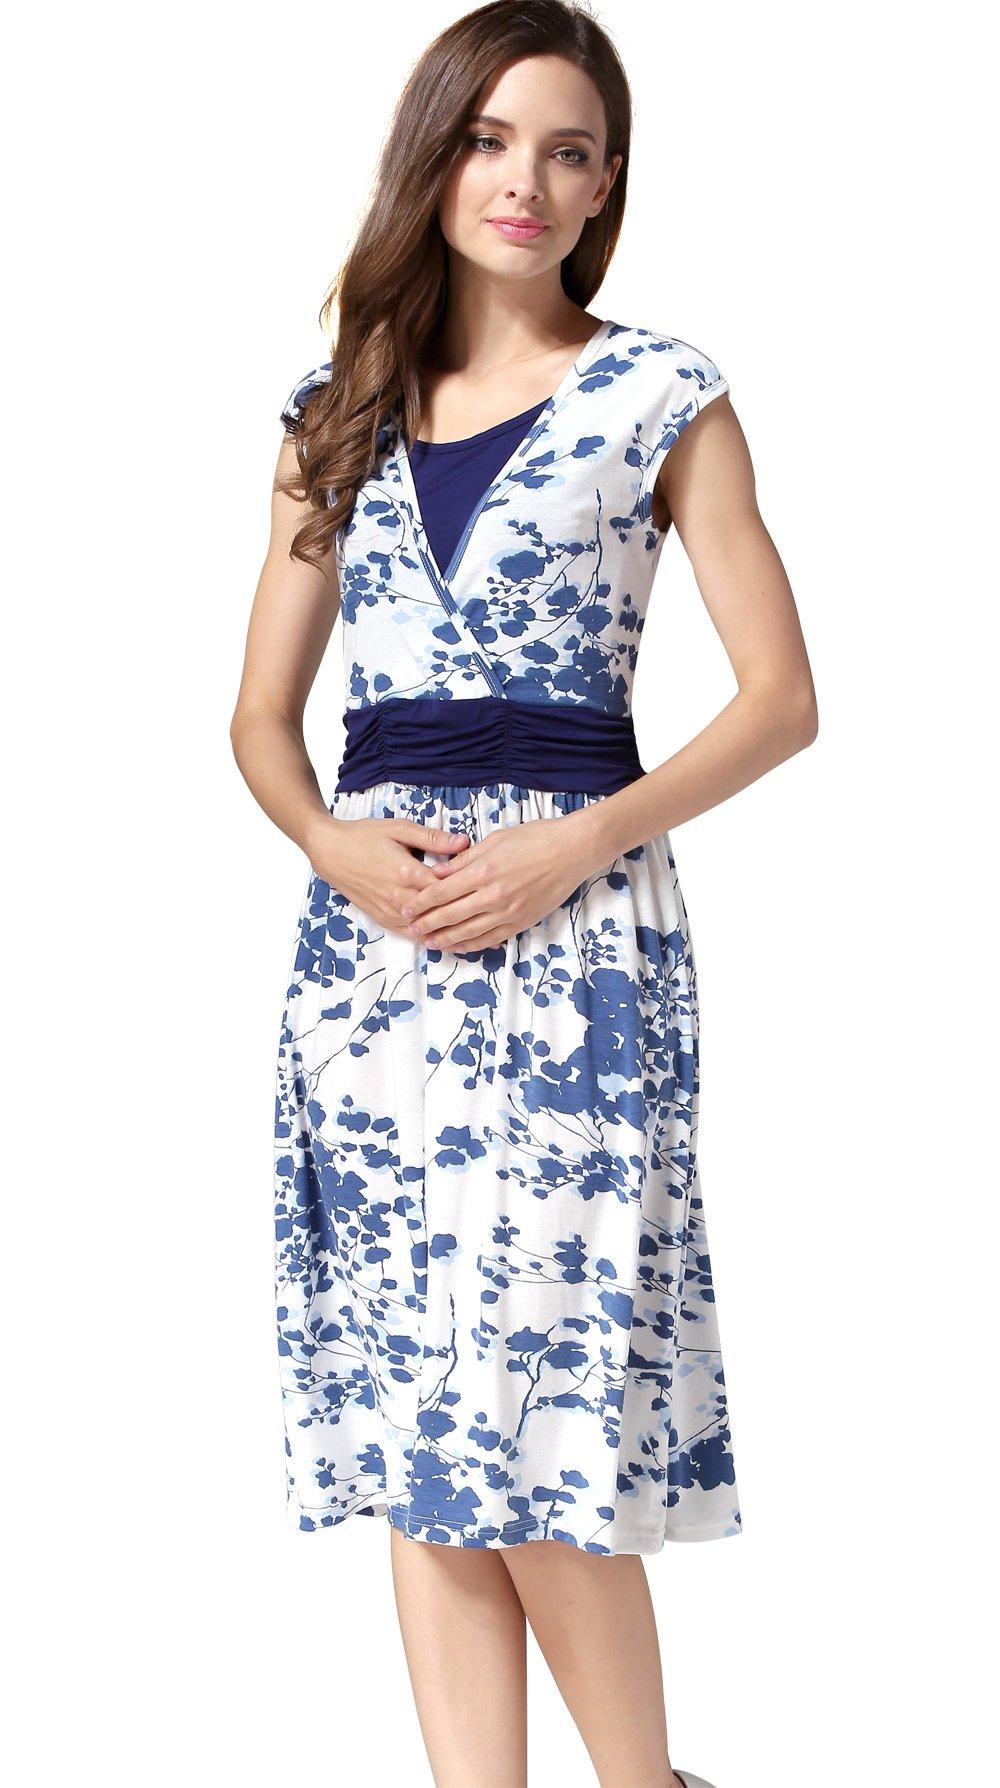 Emotion Moms Flower Maternity Clothes Breastfeeding Nursing Dresses for Pregnant Women (Medium, Blue)